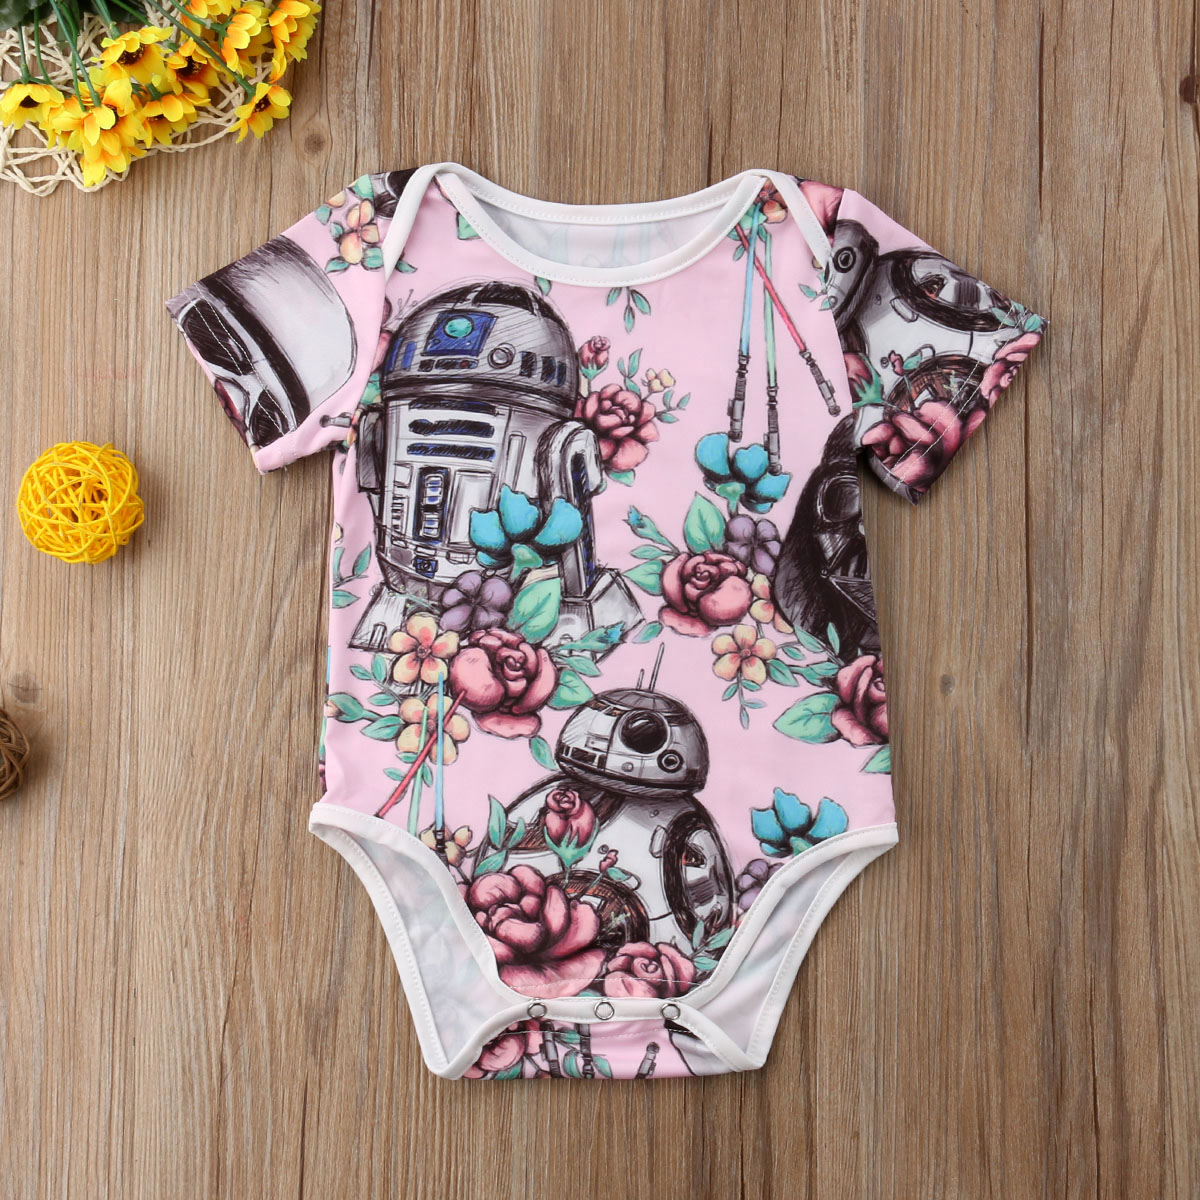 717b33aec 2018 Cute Newborn Star Wars Baby Girl Romper Jumpsuit Clothes ...